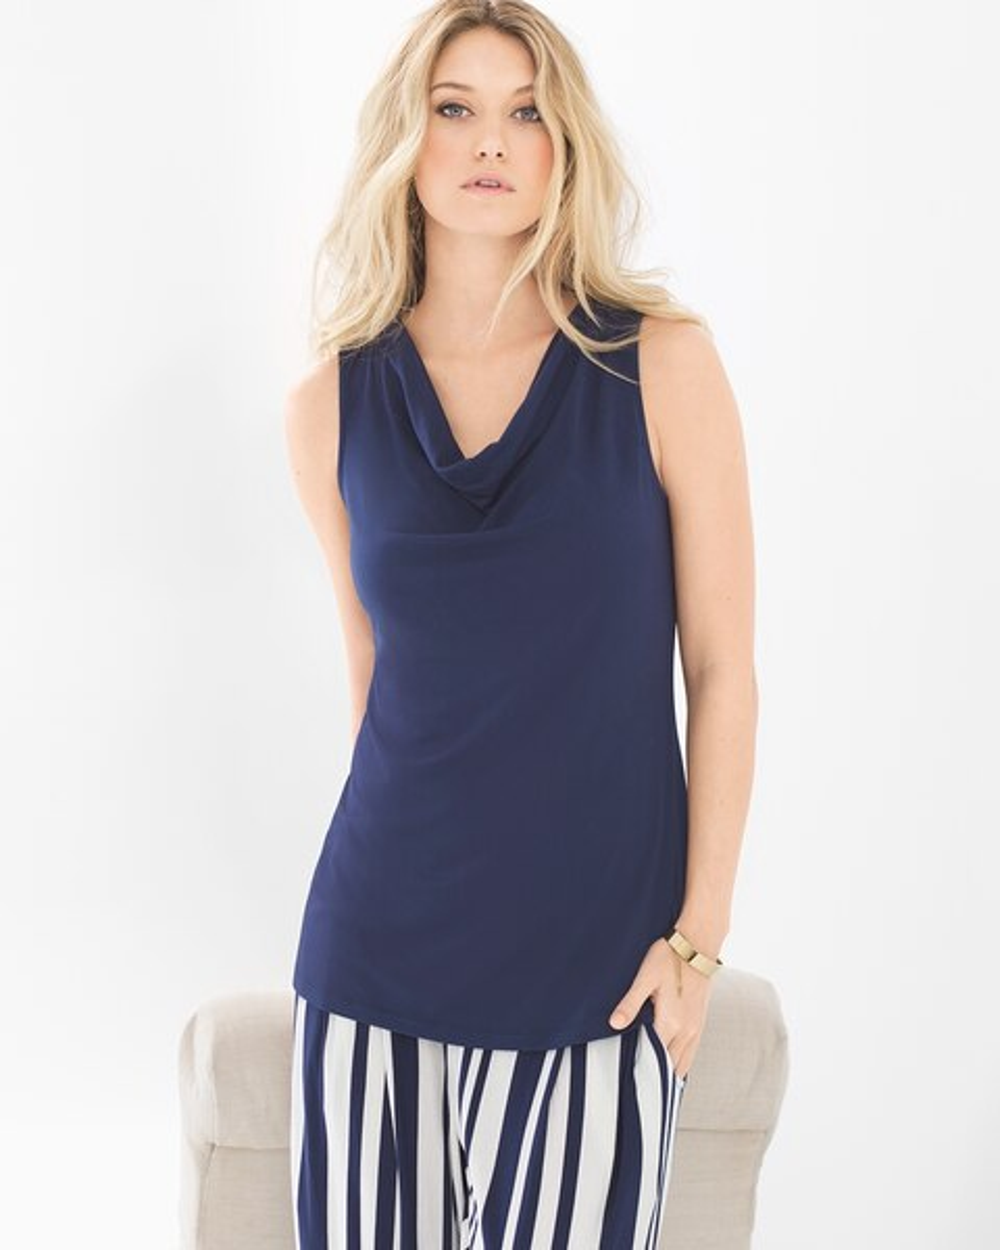 e48942960668f Shop Lounge Tank Tops for Women - Loungewear - Soma